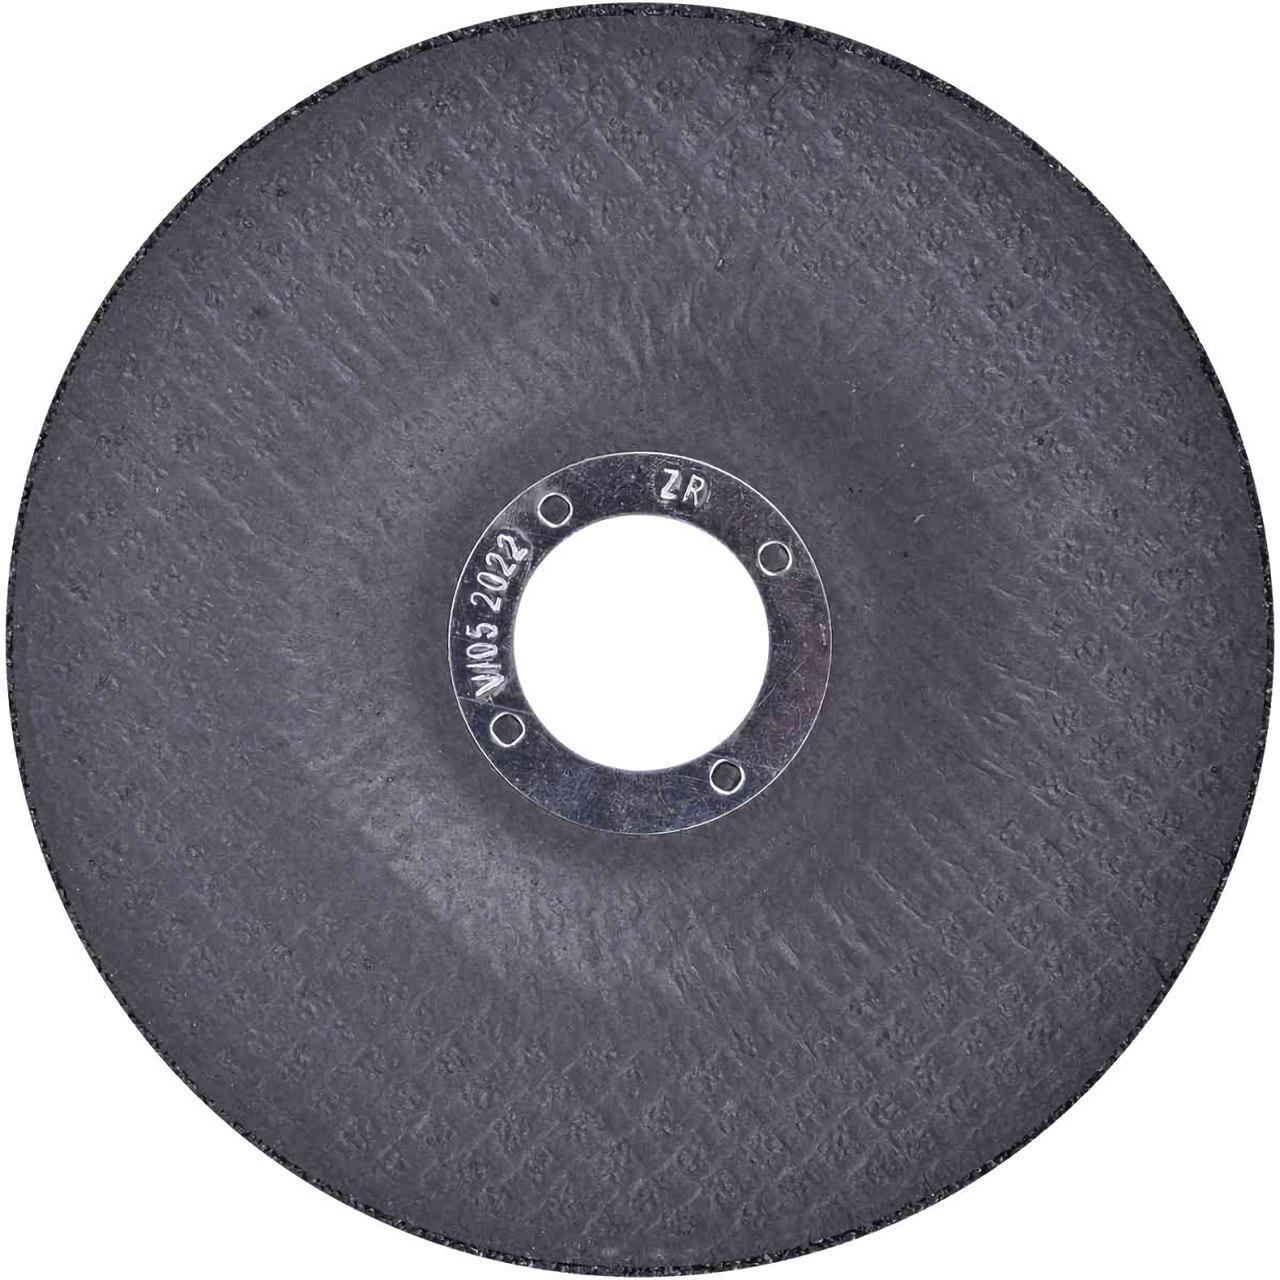 "Disco de desbaste de metal 4.1/2"" x 6 x7/8"" Stanley Sta0413fz"